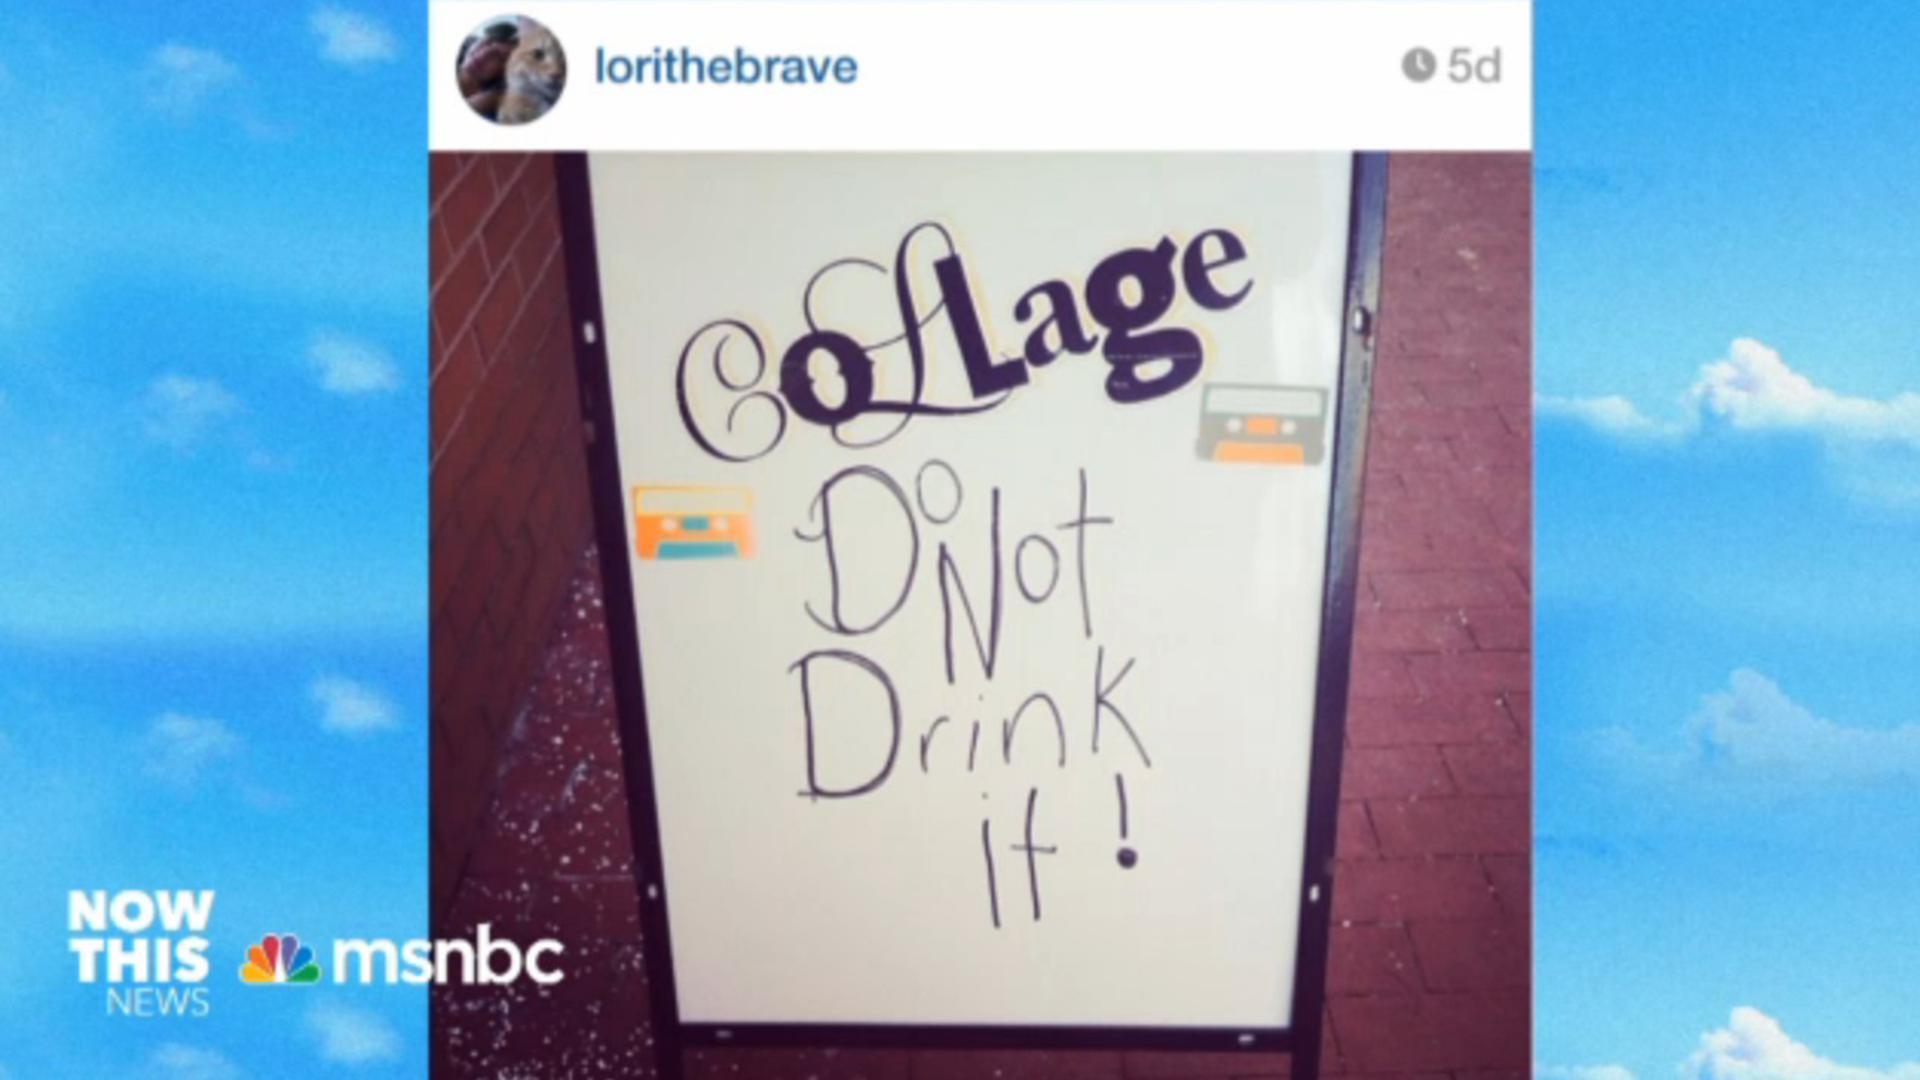 Instagram pics of West Virginia water crisis